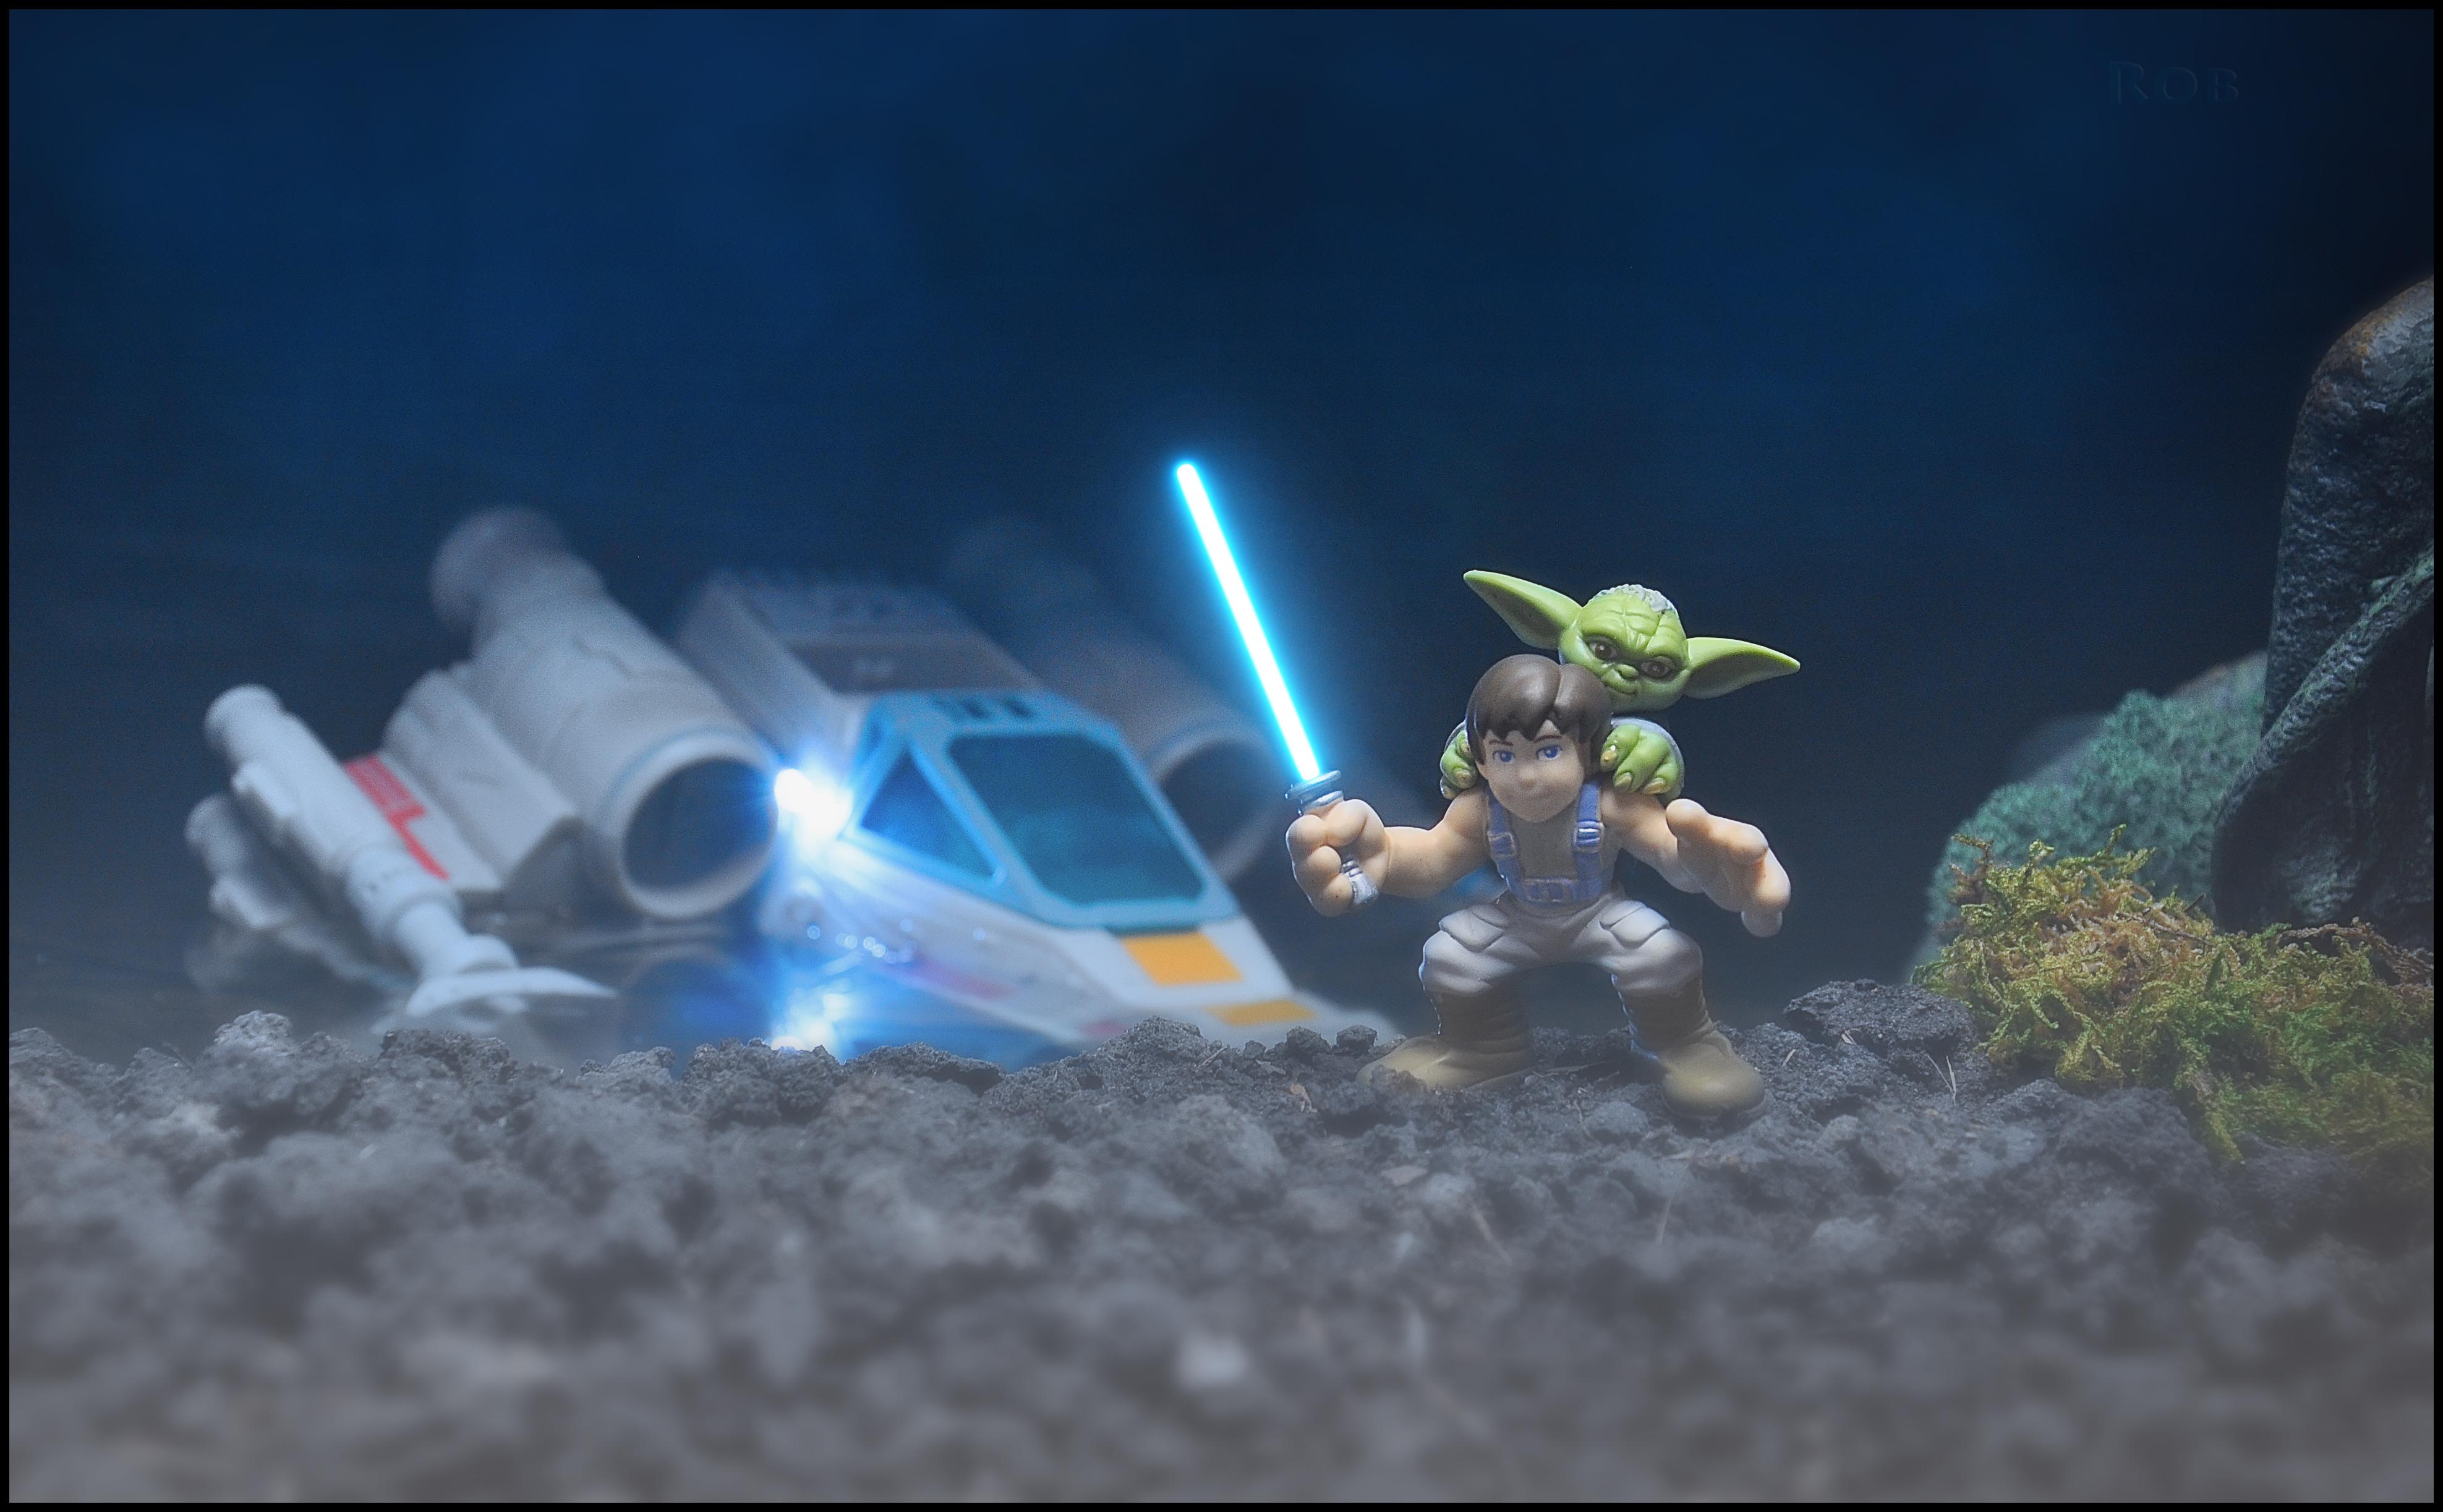 Toy Starwars Nikon Yoda Xwing Collectible Lukeskywalker Hasbro Dagobah Theempirestrikesback Galacticheroes Nikond90